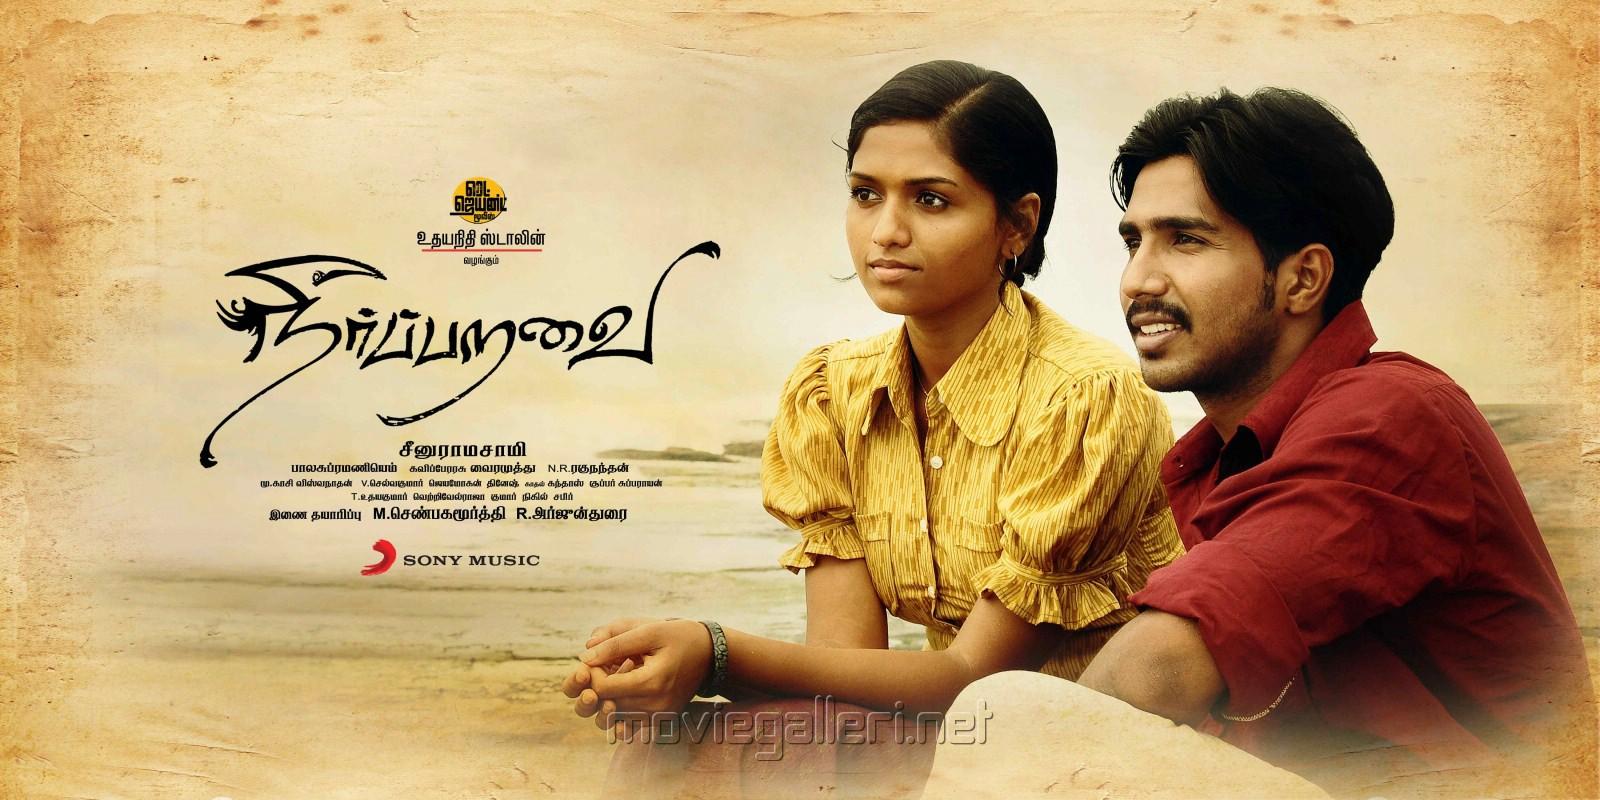 Thiruttuvcd Tamil Movie Neerparavai Cinderella Cartoon In Hindi